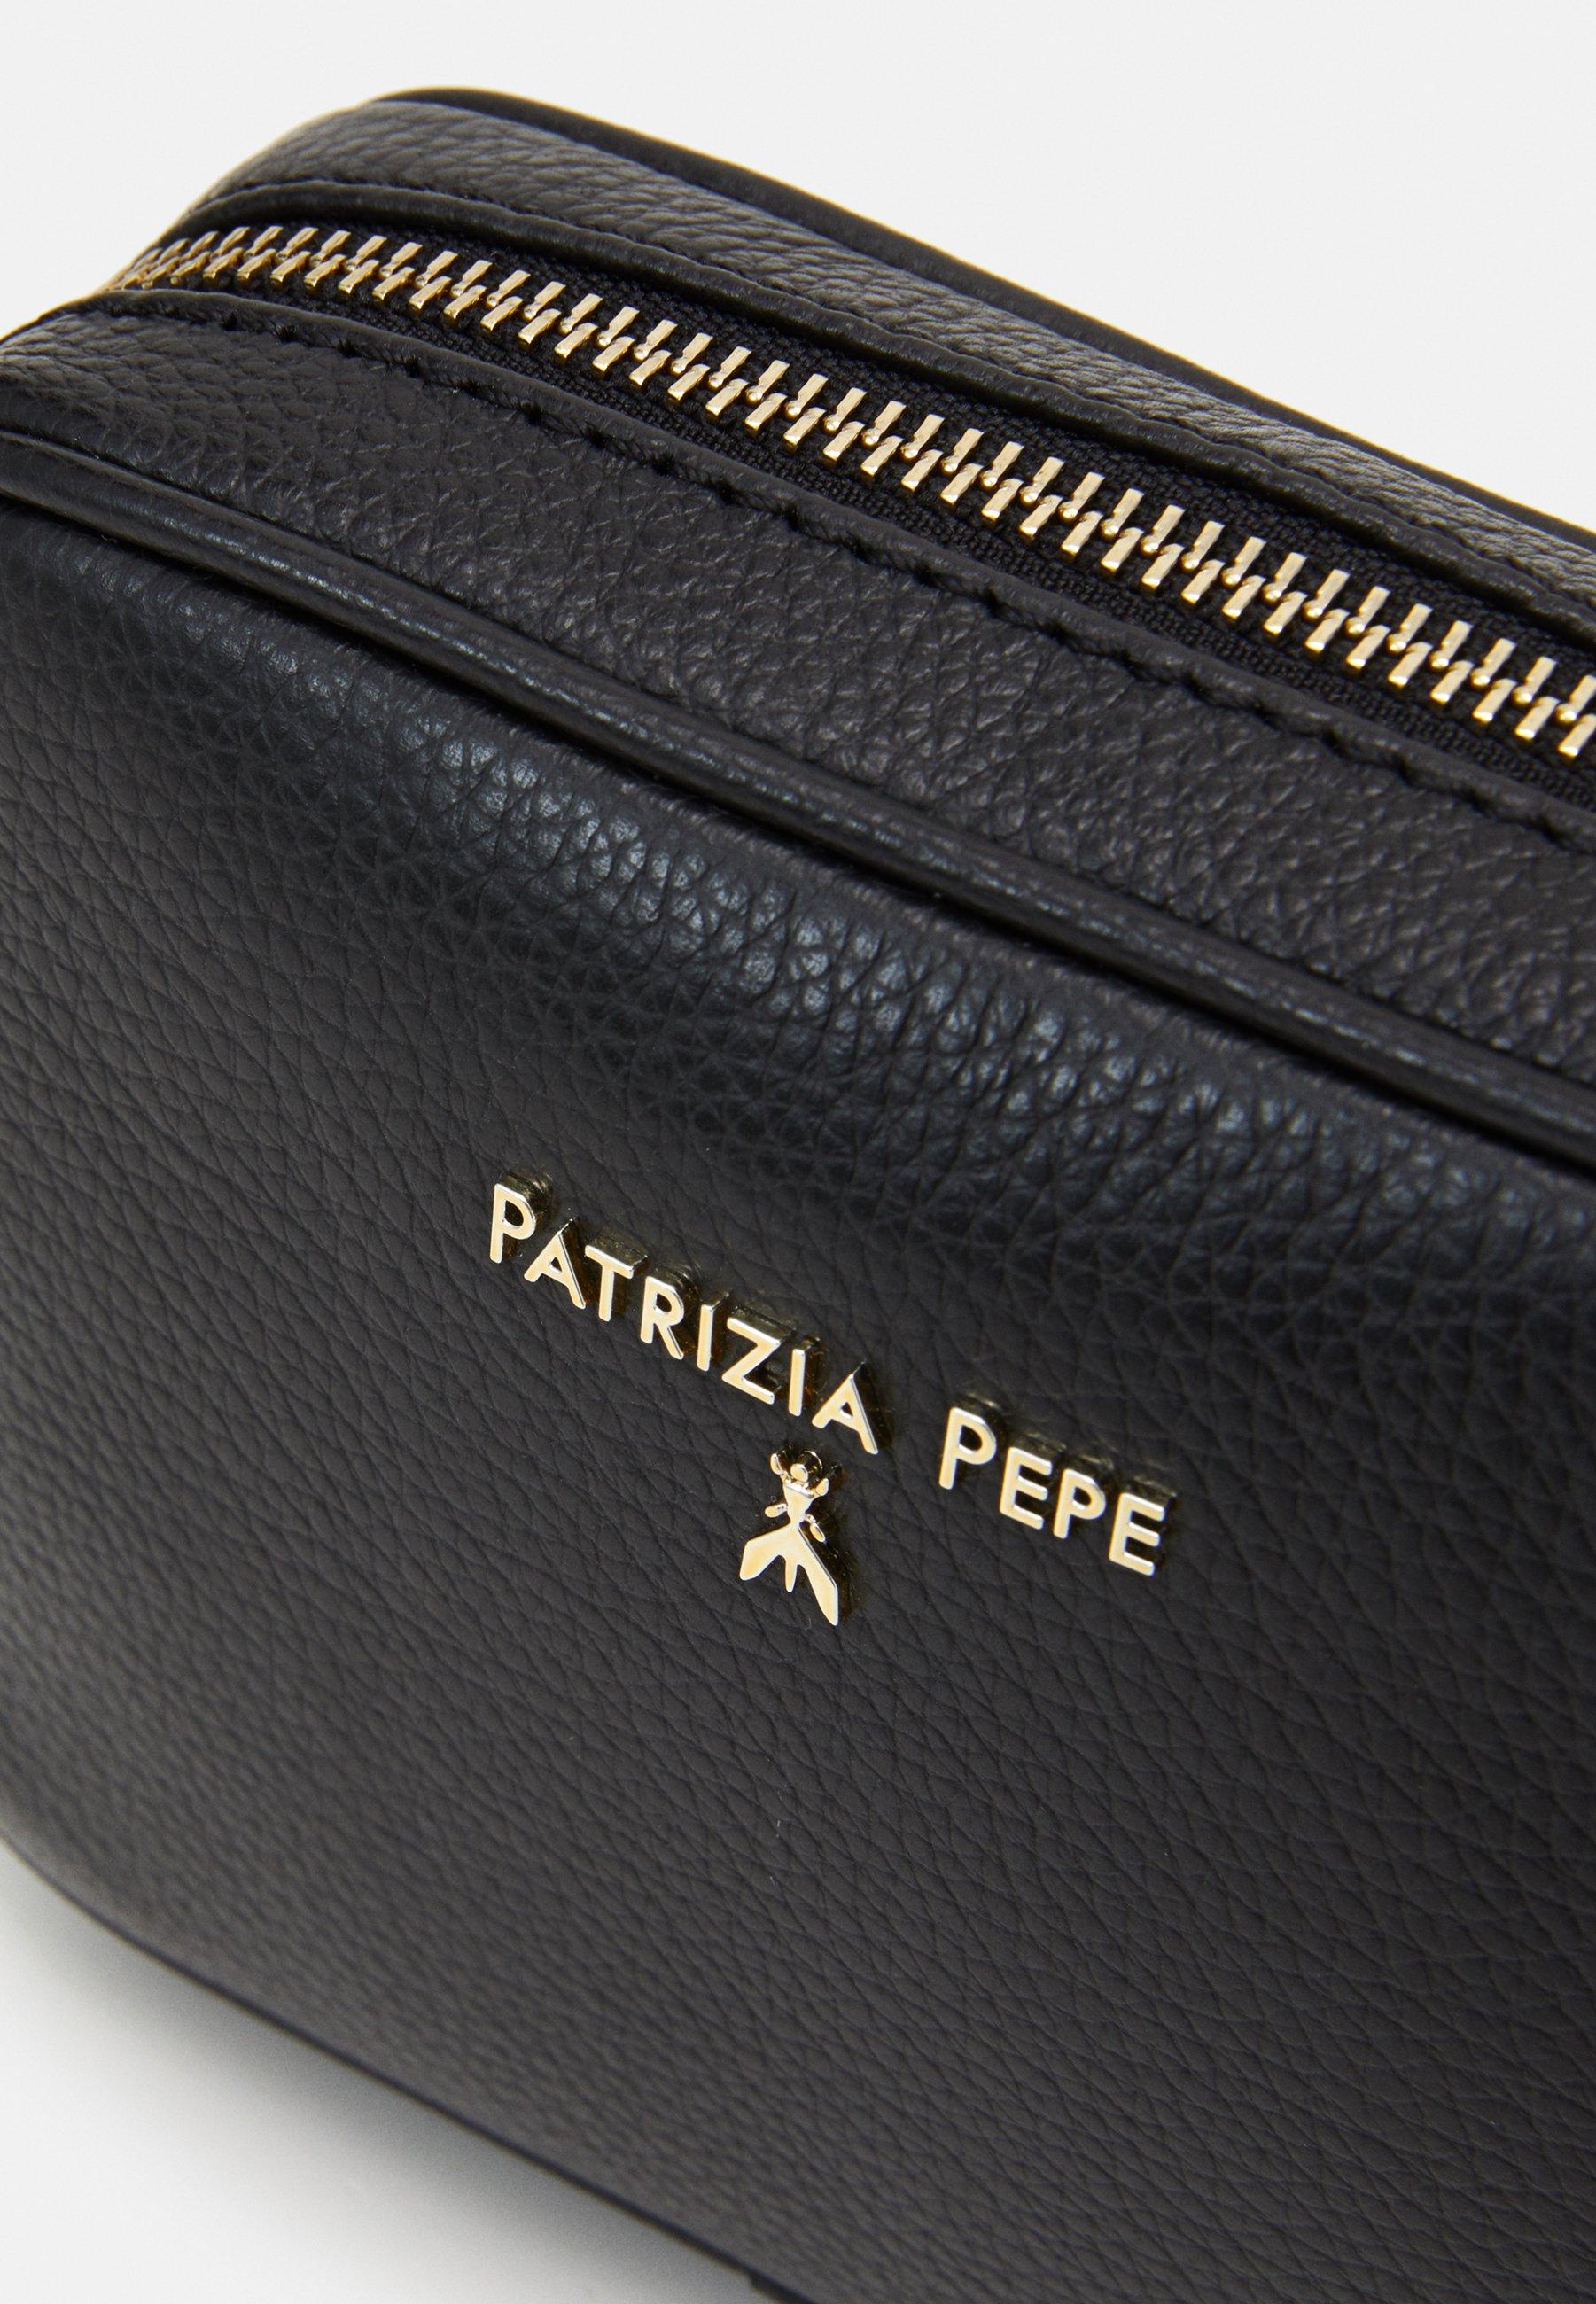 Patrizia Pepe Skuldertasker - Nero